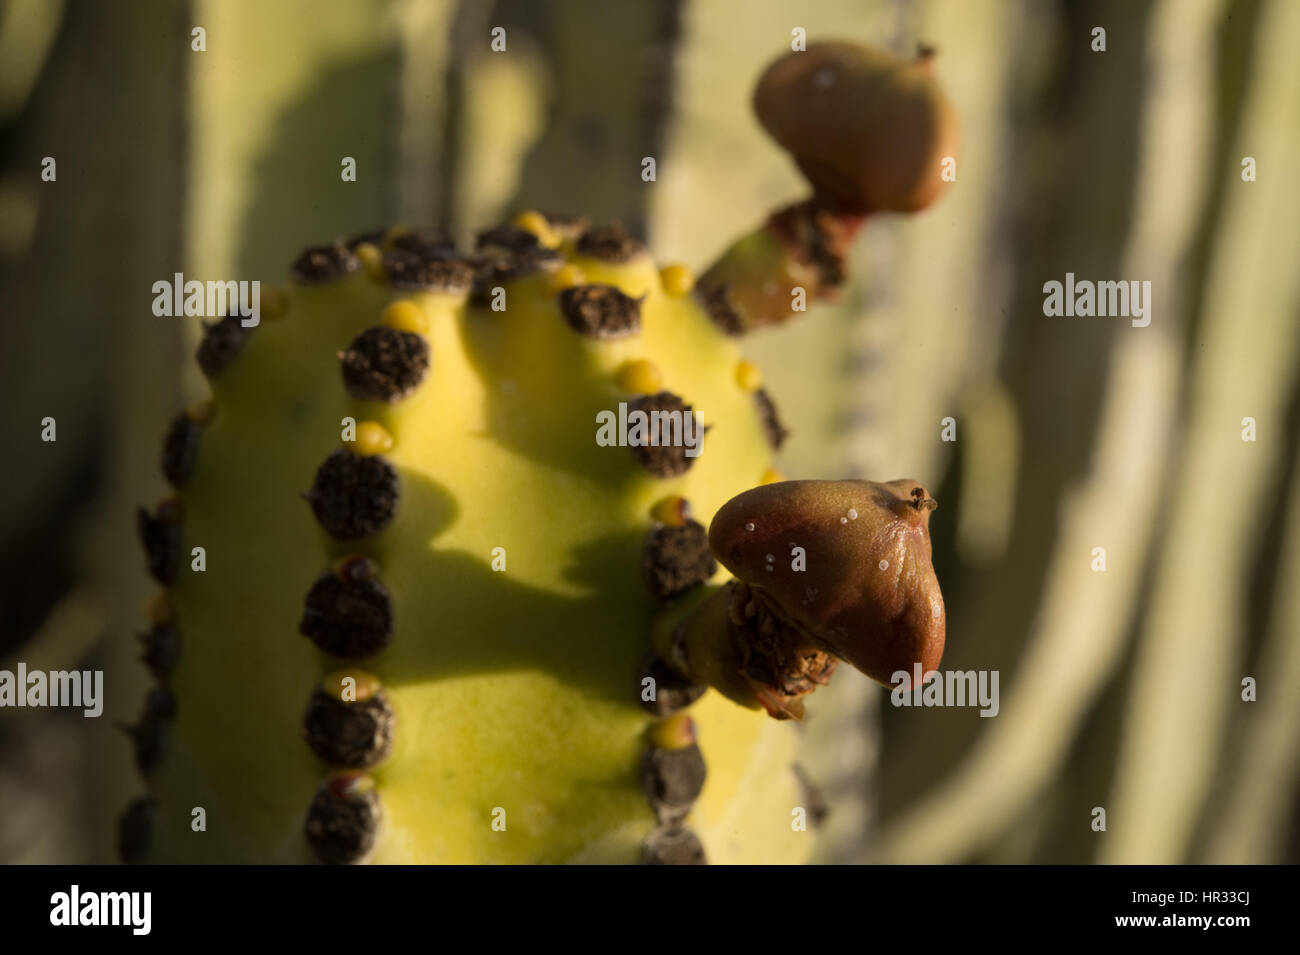 Canarie Spurge, Euphorbia canariensis, Euphorbiaceae, Tenerife South, Canarian Islands, Spain, Europe - Stock Image